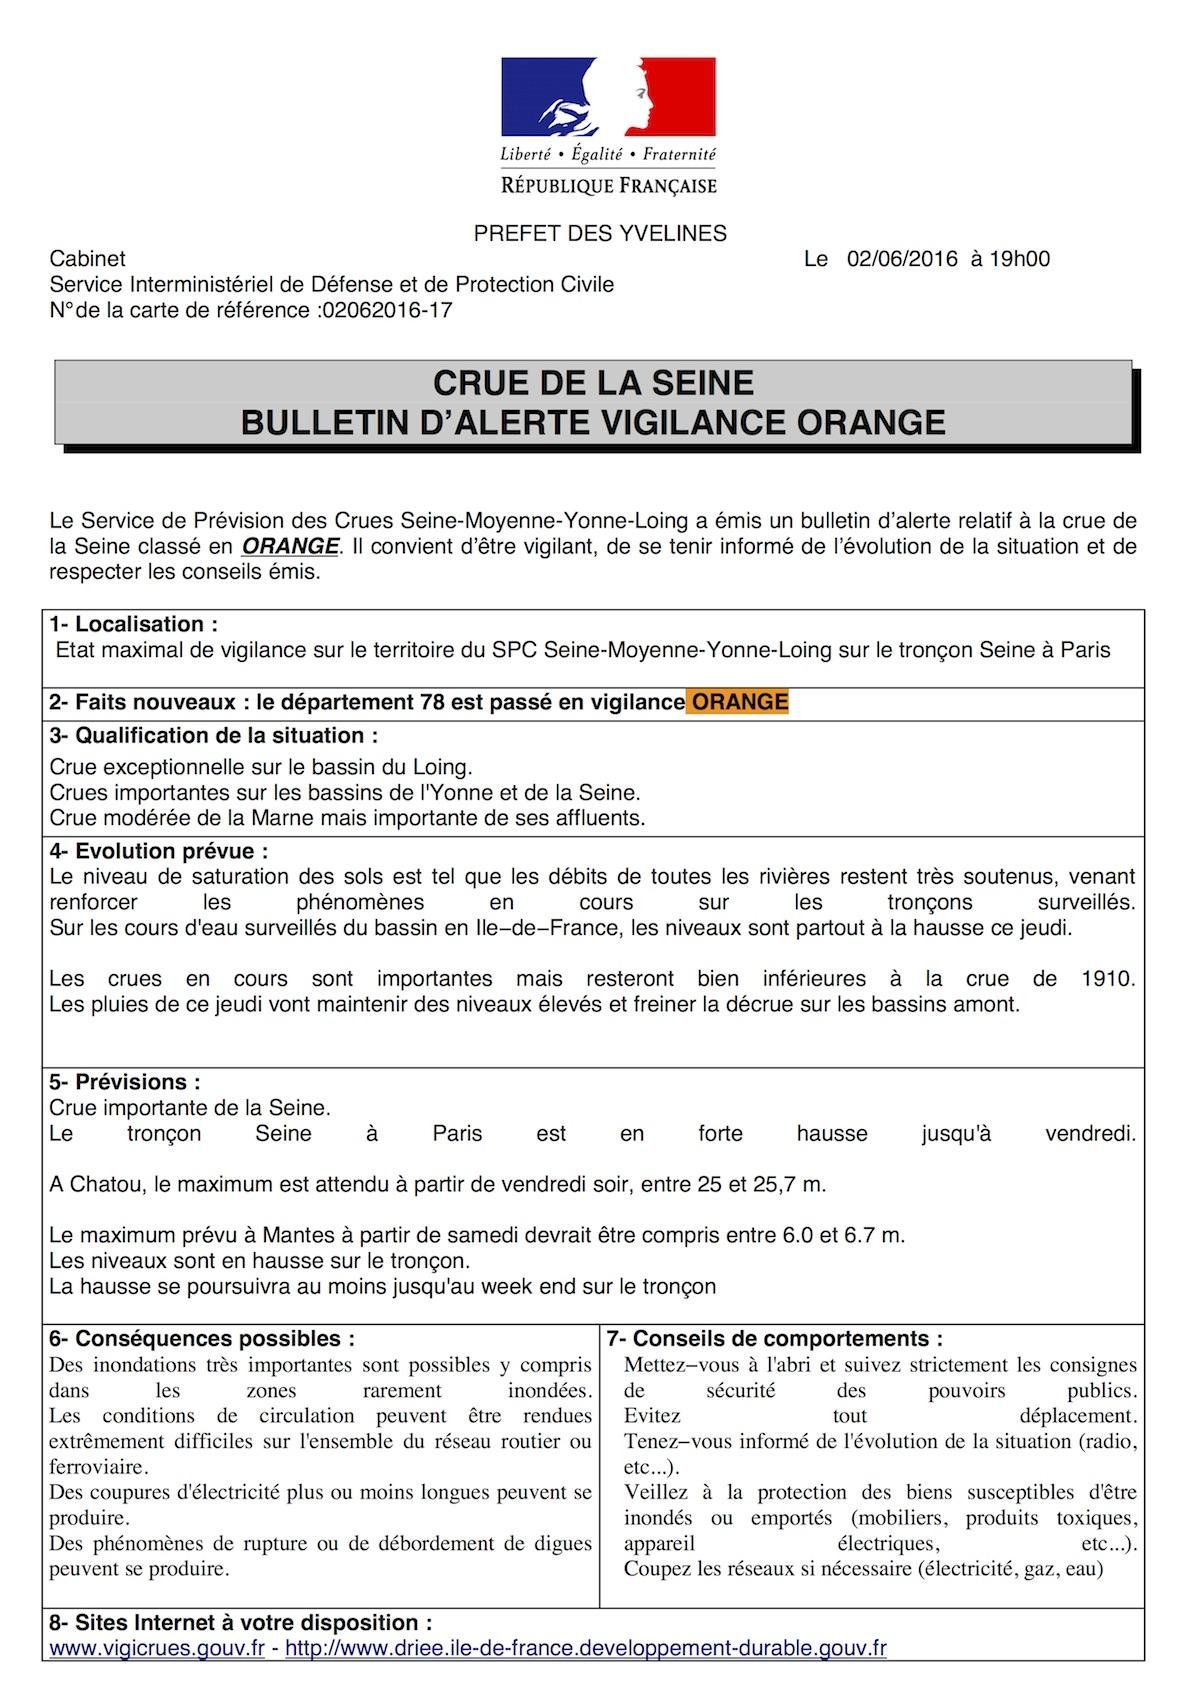 BulletinAlerteOrange02.06.2016 (1)